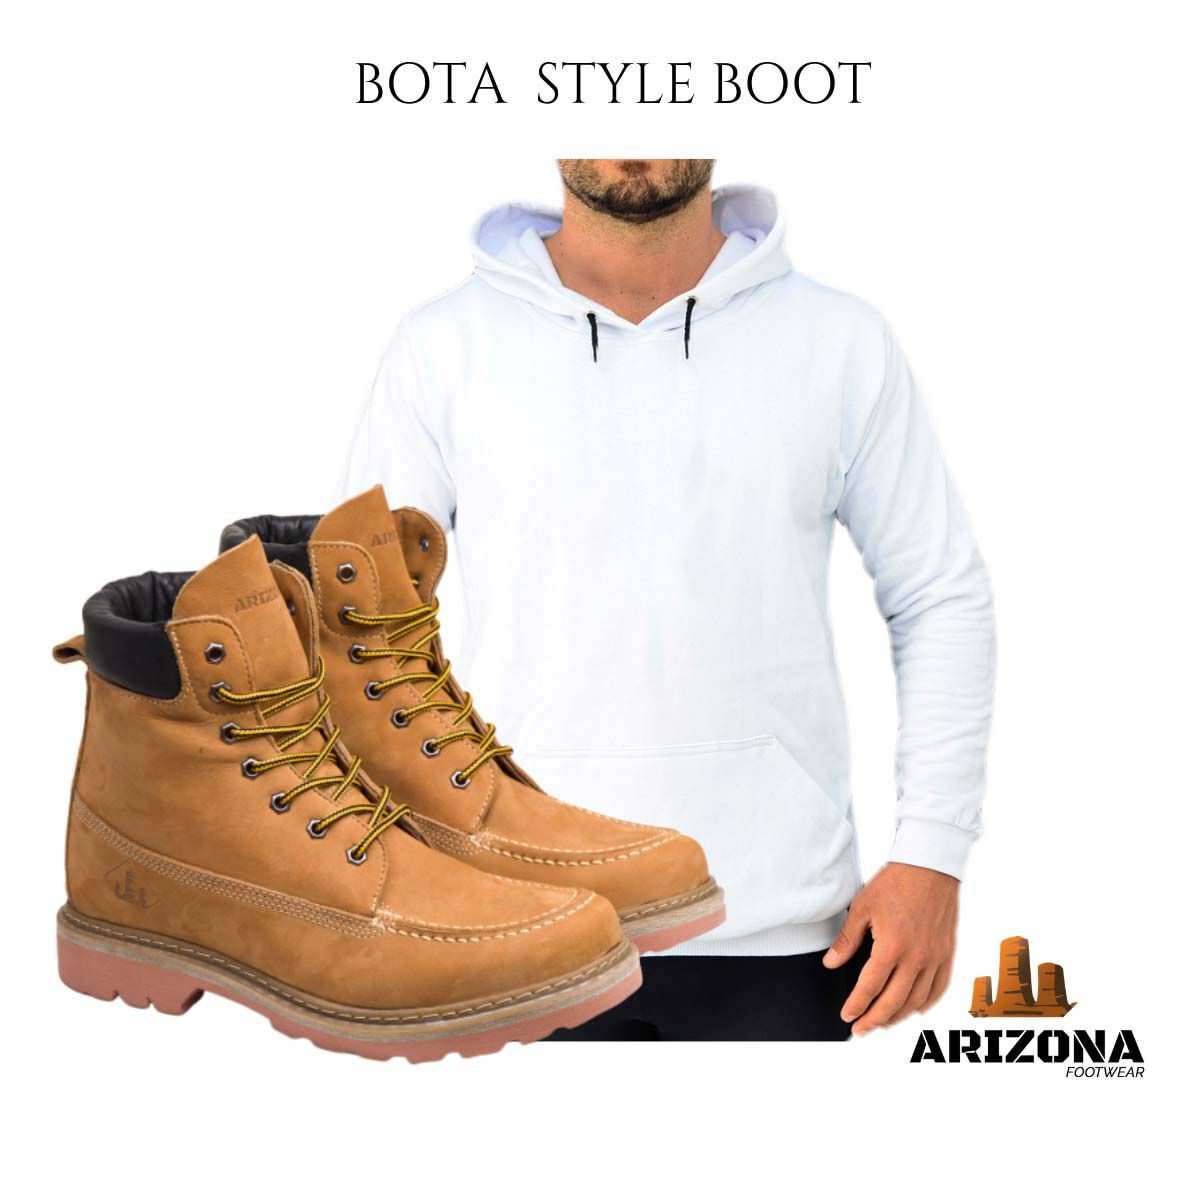 Bota Coturno Adventure Arizona Canyon Boot  Moleton Liso Branco